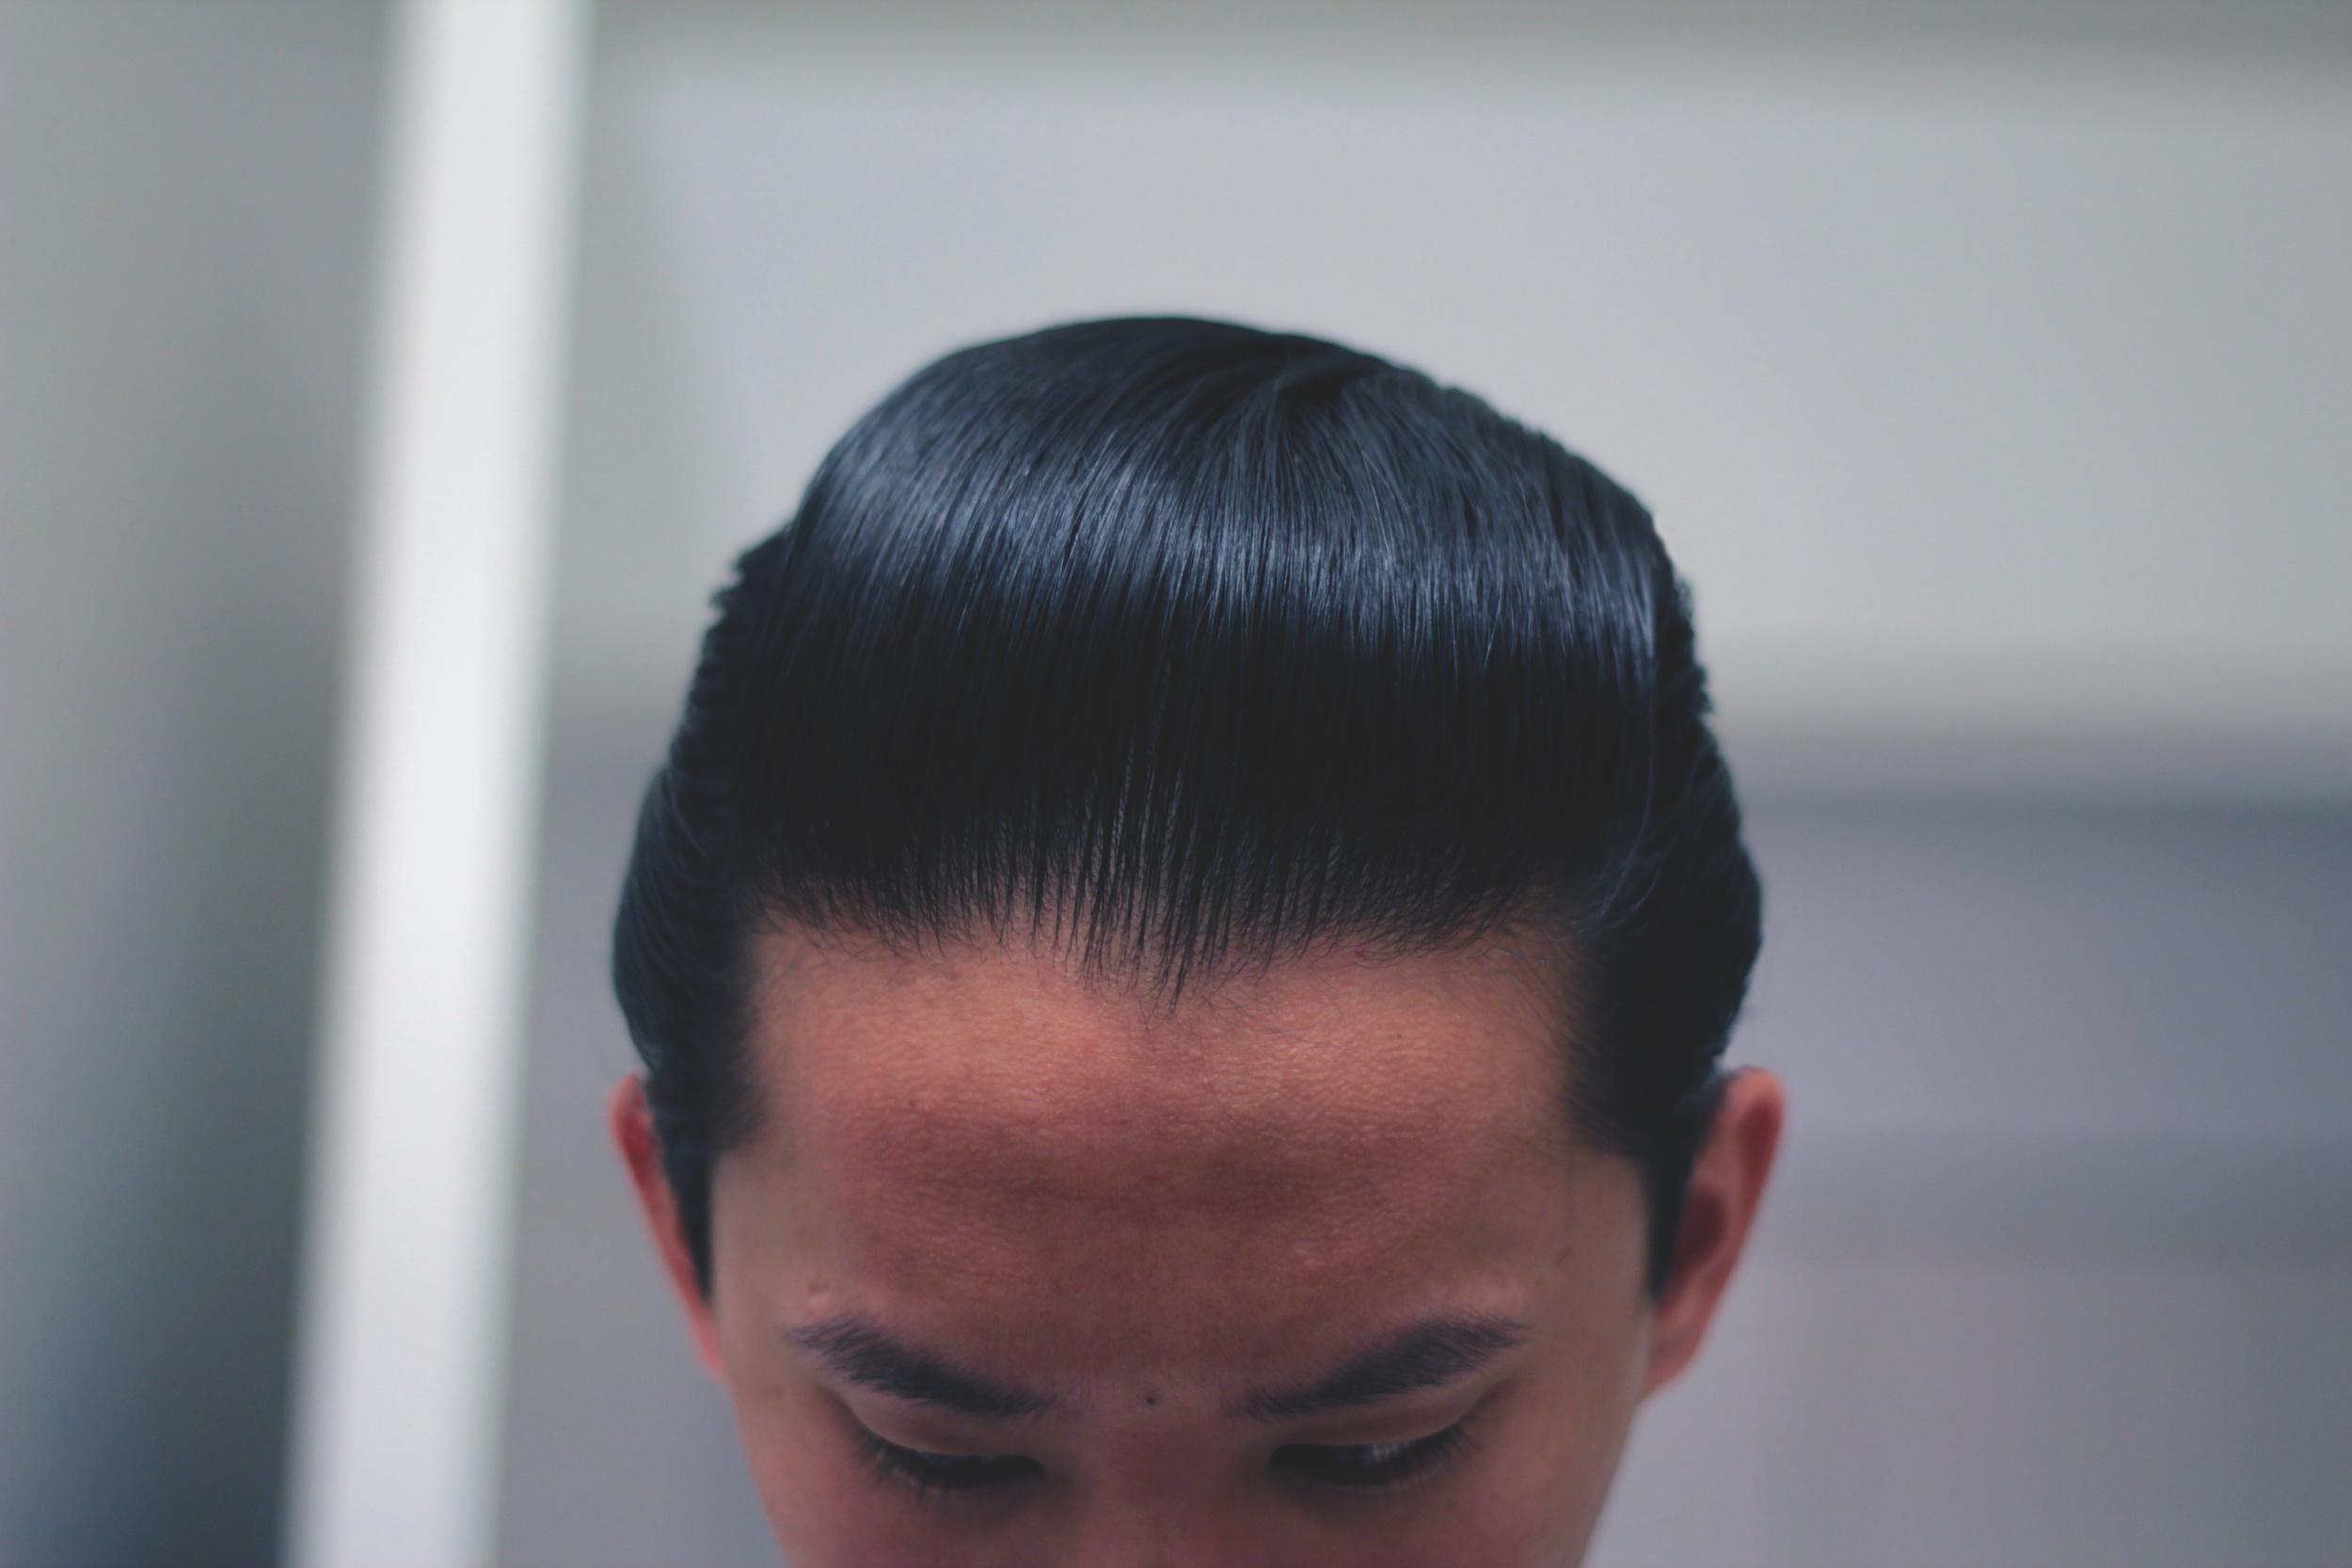 lockhart's goon grease hair pomade - pomp front